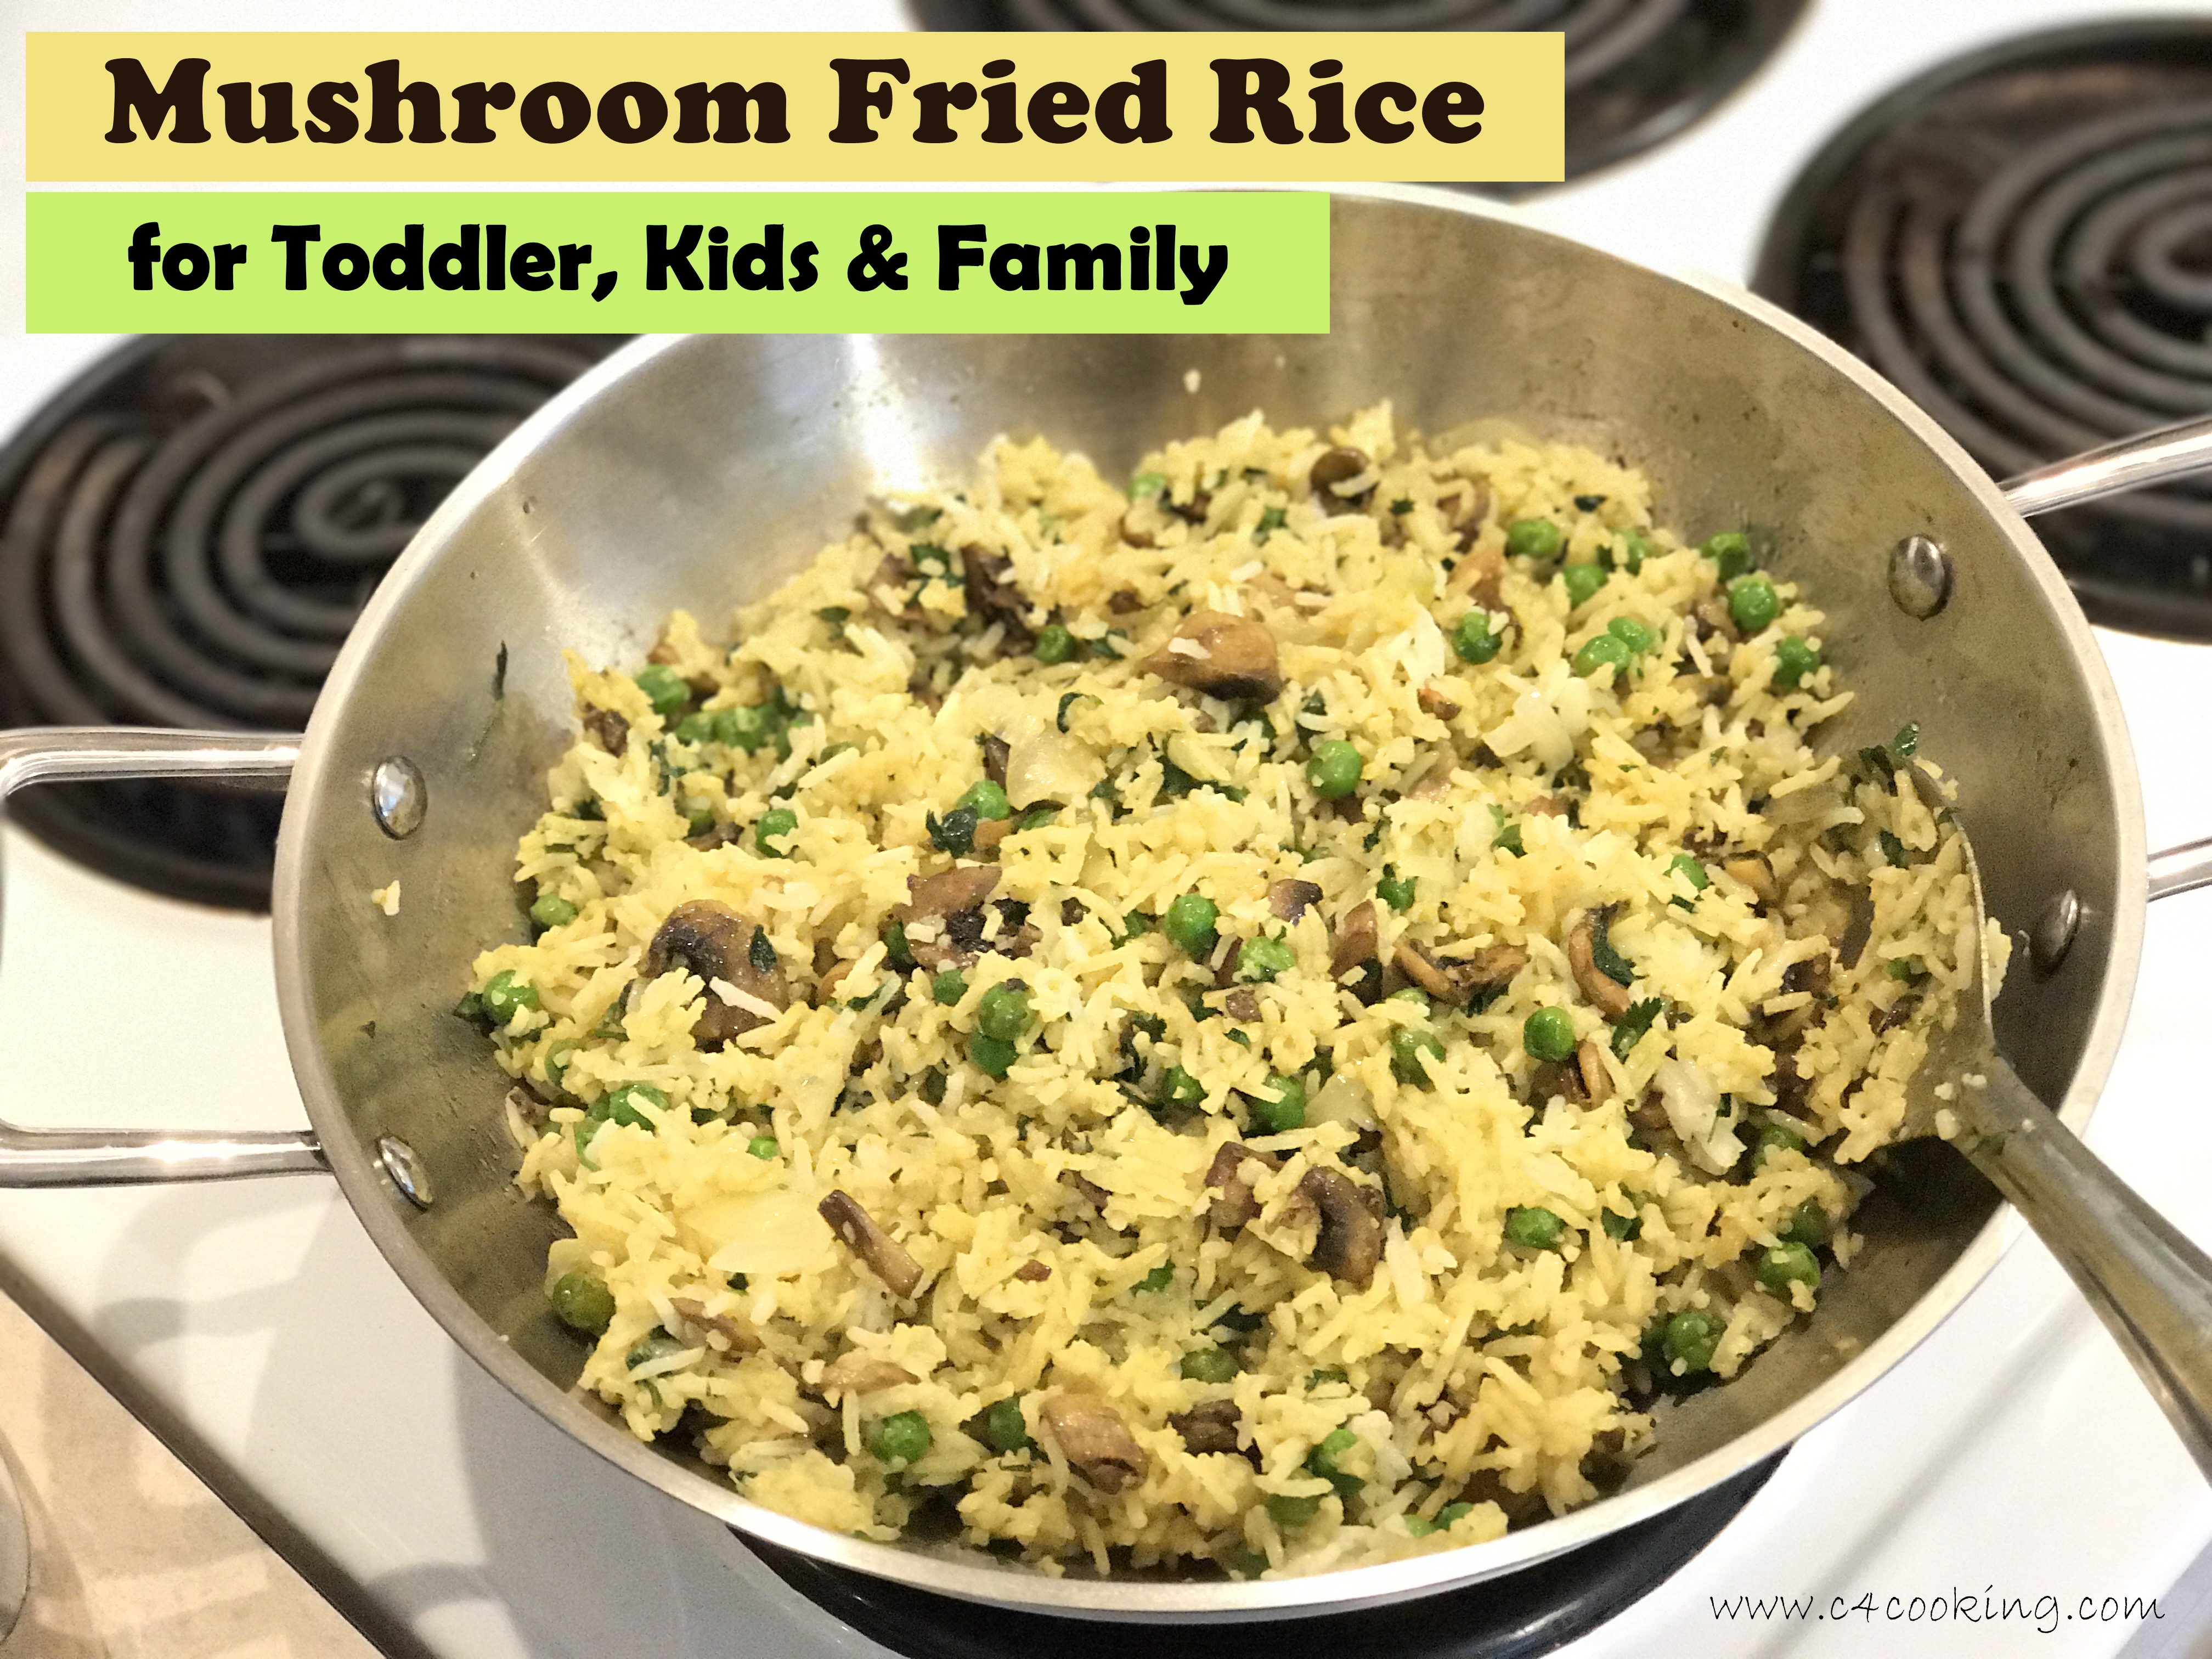 Mushroom fried rice, toddler kids mushroom recipe